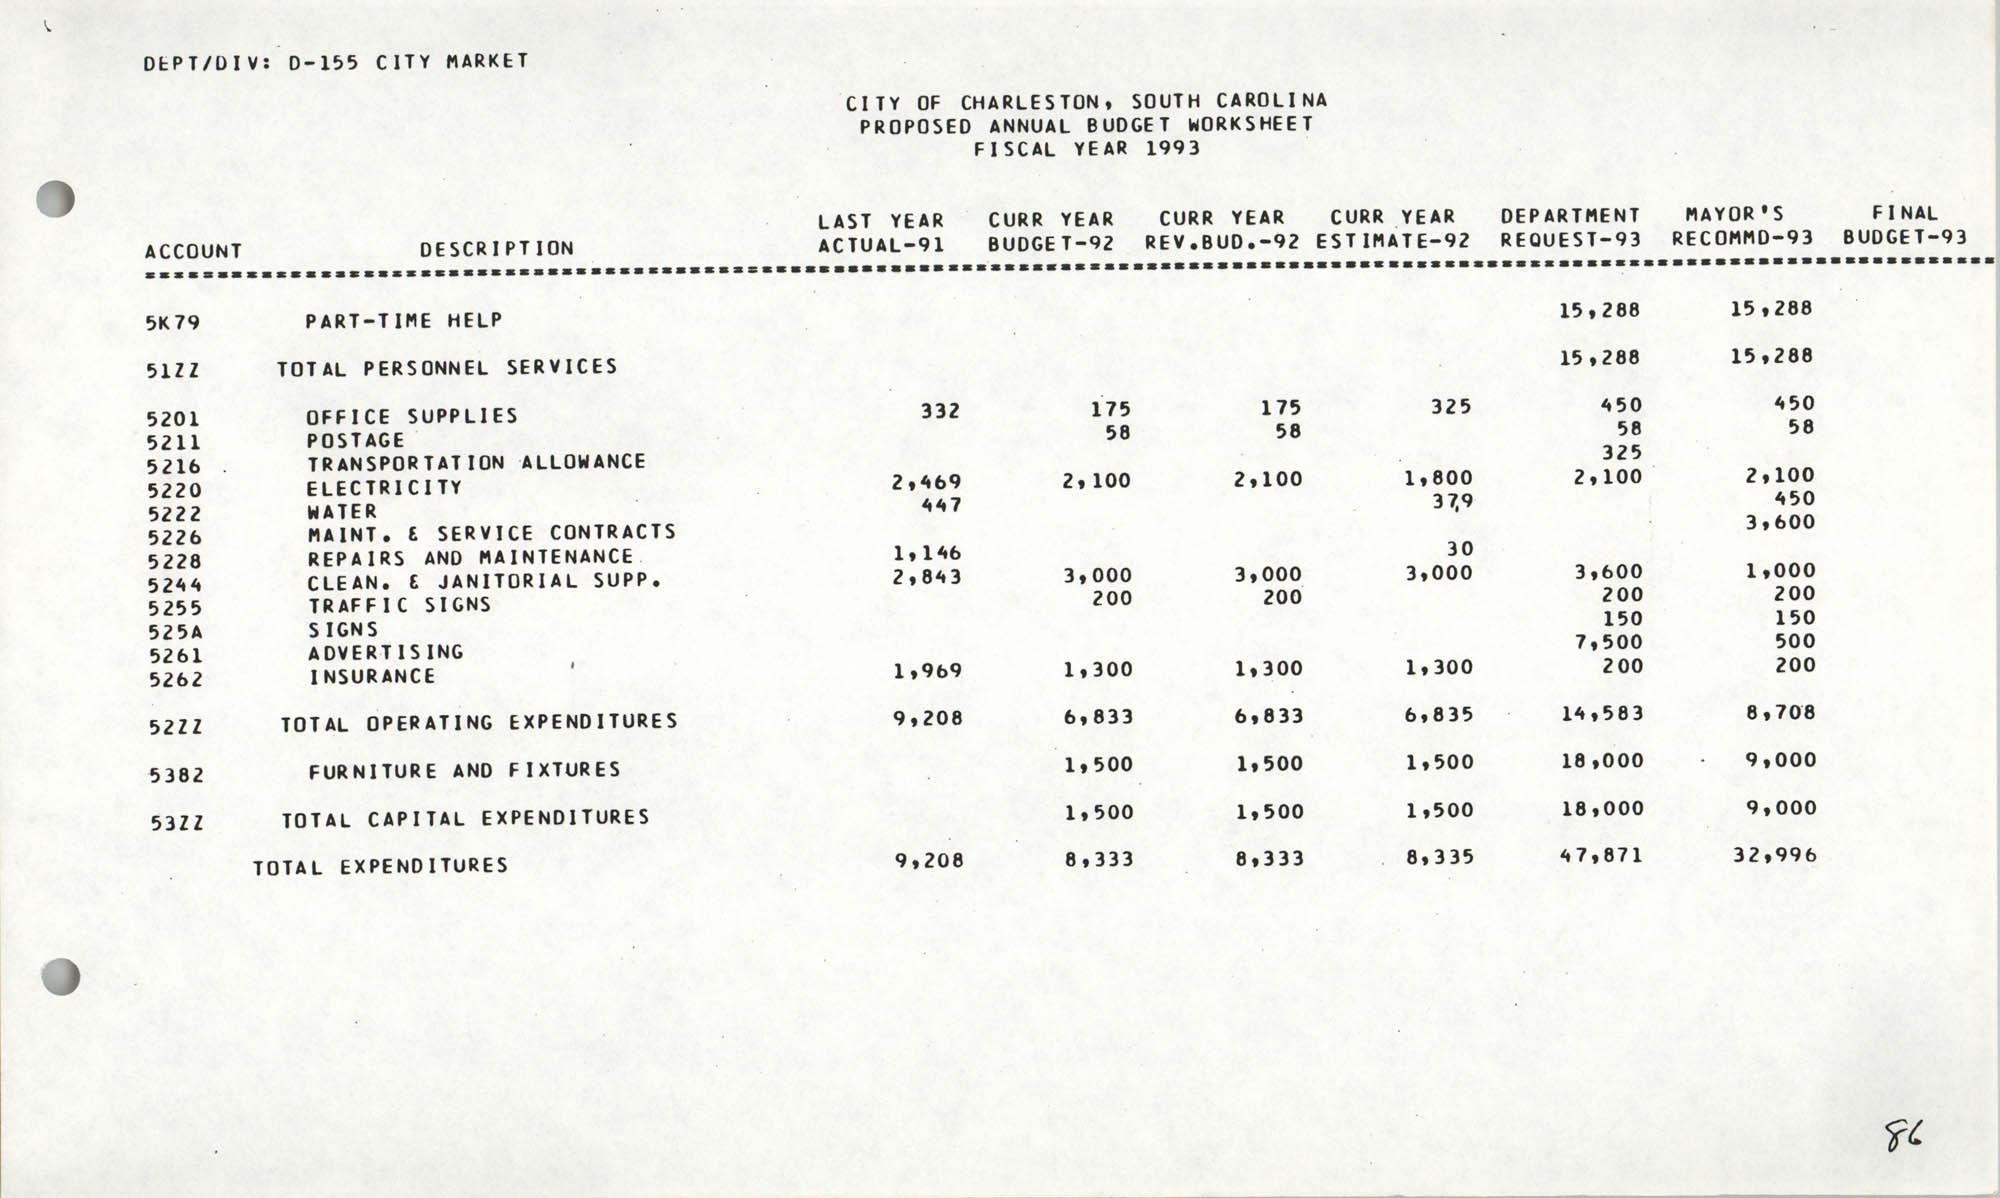 The City Council of Charleston, South Carolina, 1993 Budget, Page 86